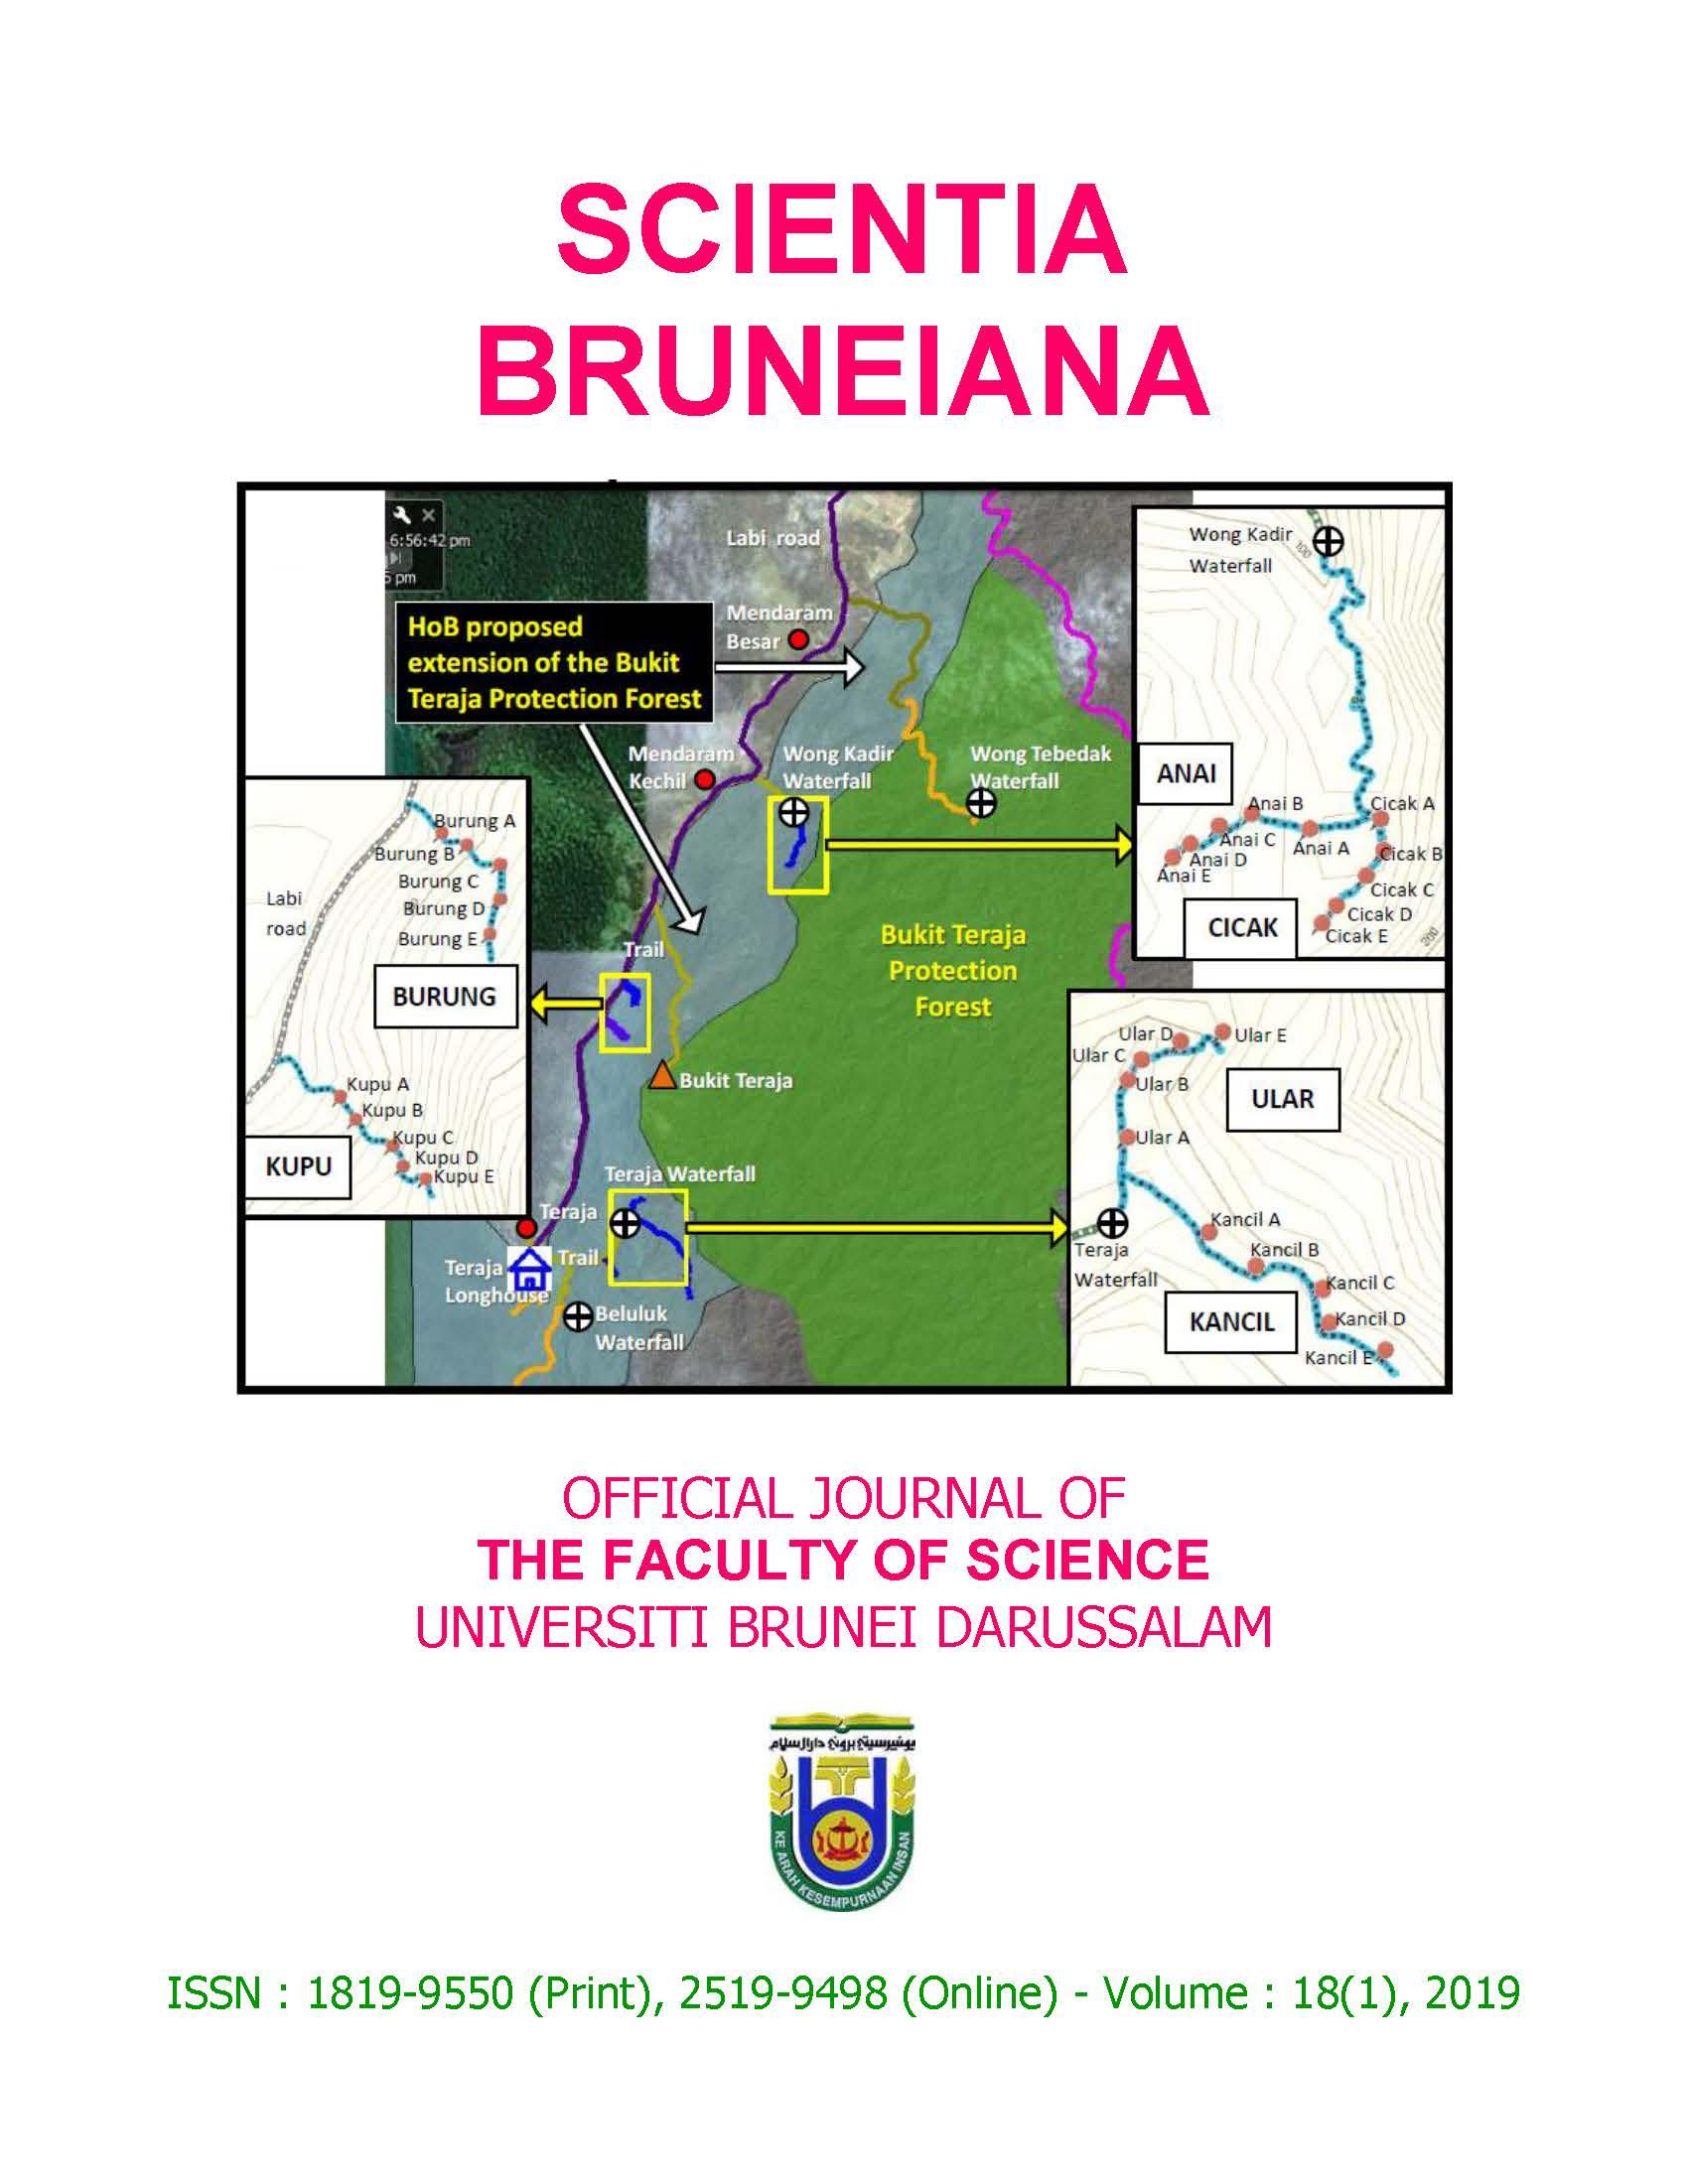 Scientia Bruneiana